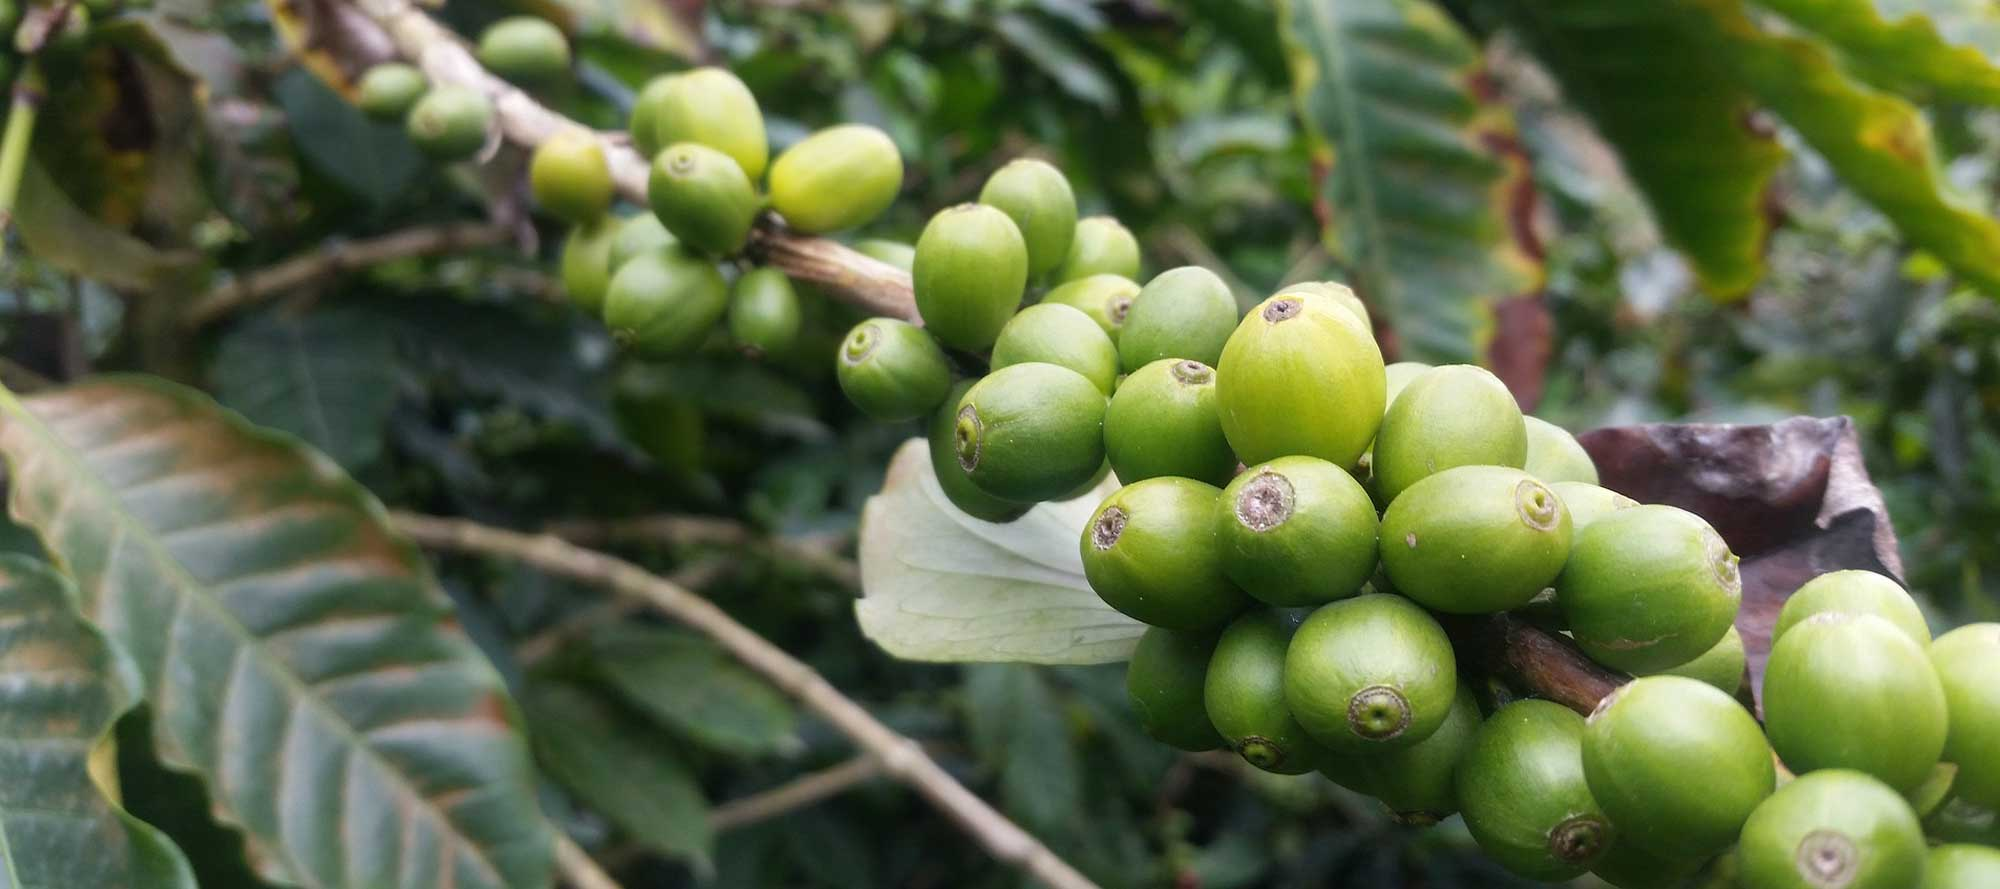 zar-cafe-melzo-caffe-colombiani